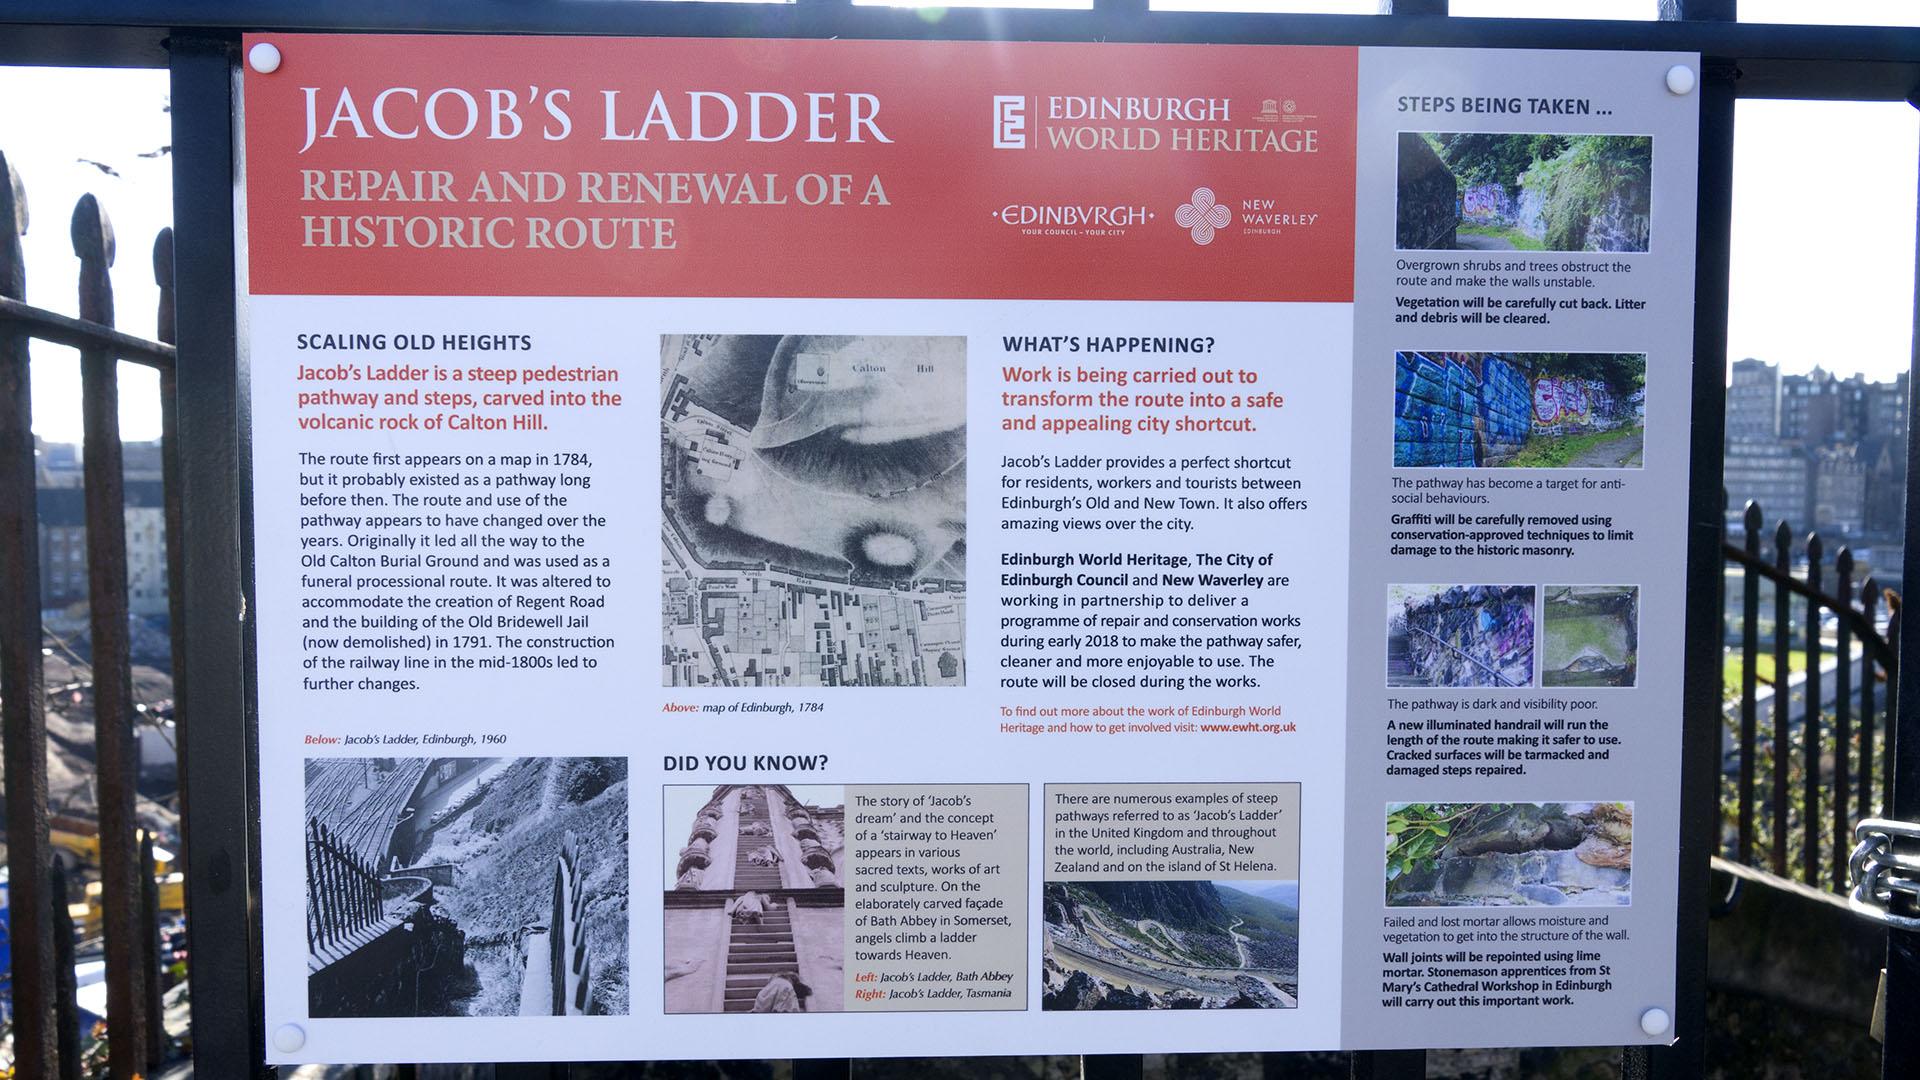 jacobs_ladder_32